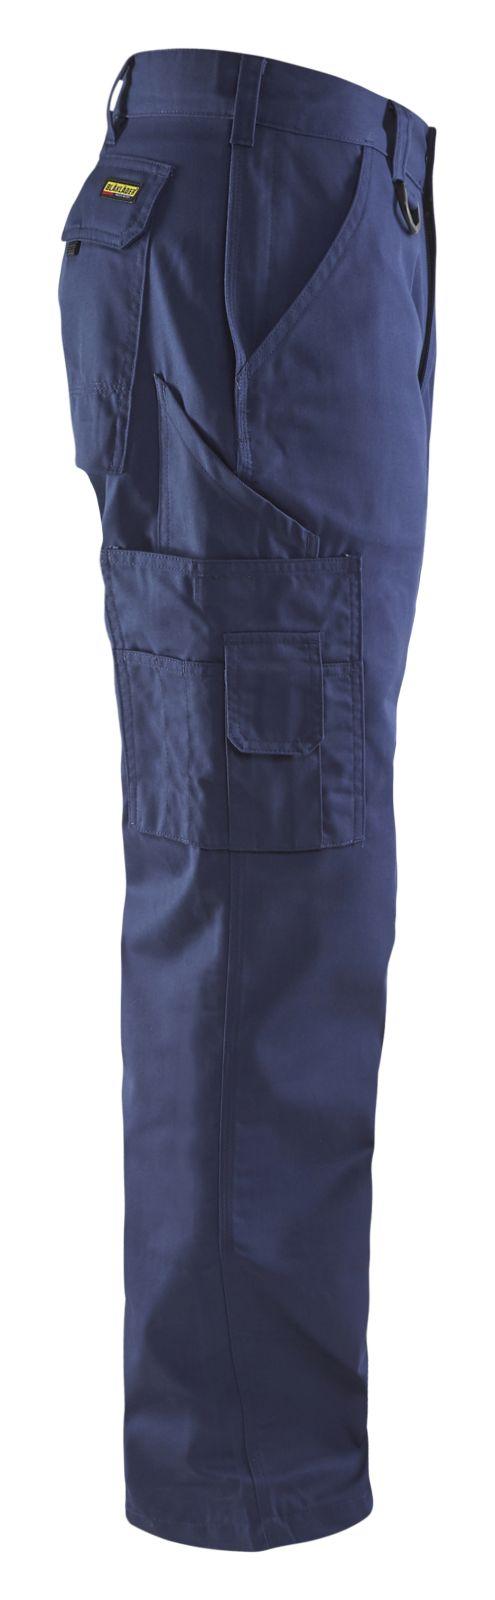 Blaklader Broeken 14071800 marineblauw(8900)